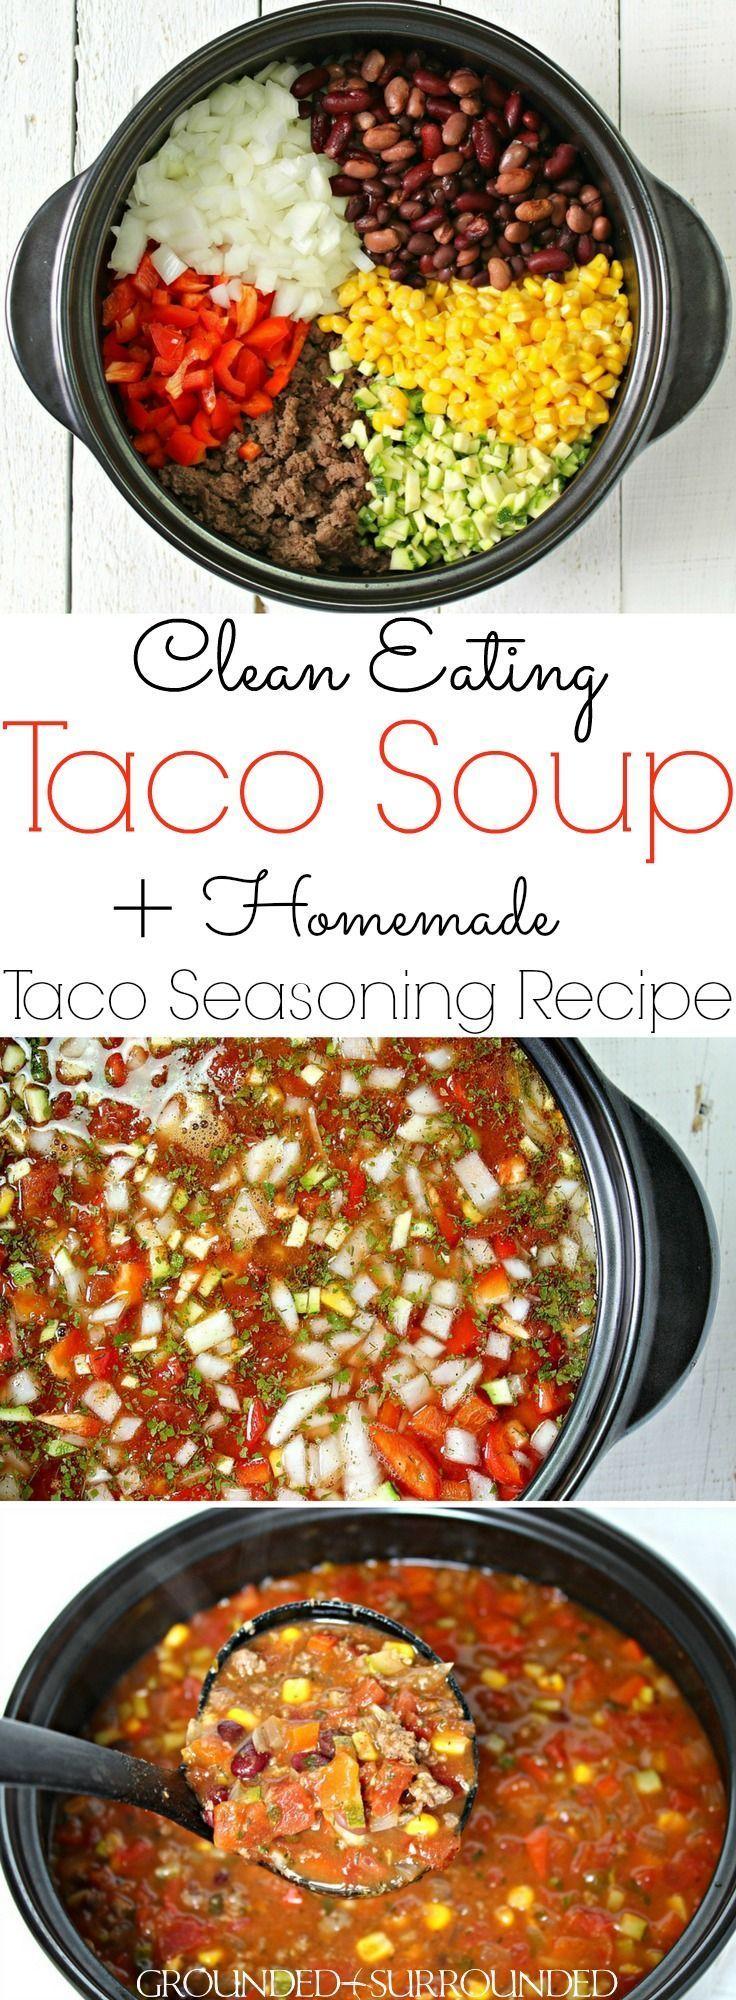 Taco Soup + Homemade Taco Seasoning Recipe #cleaneating